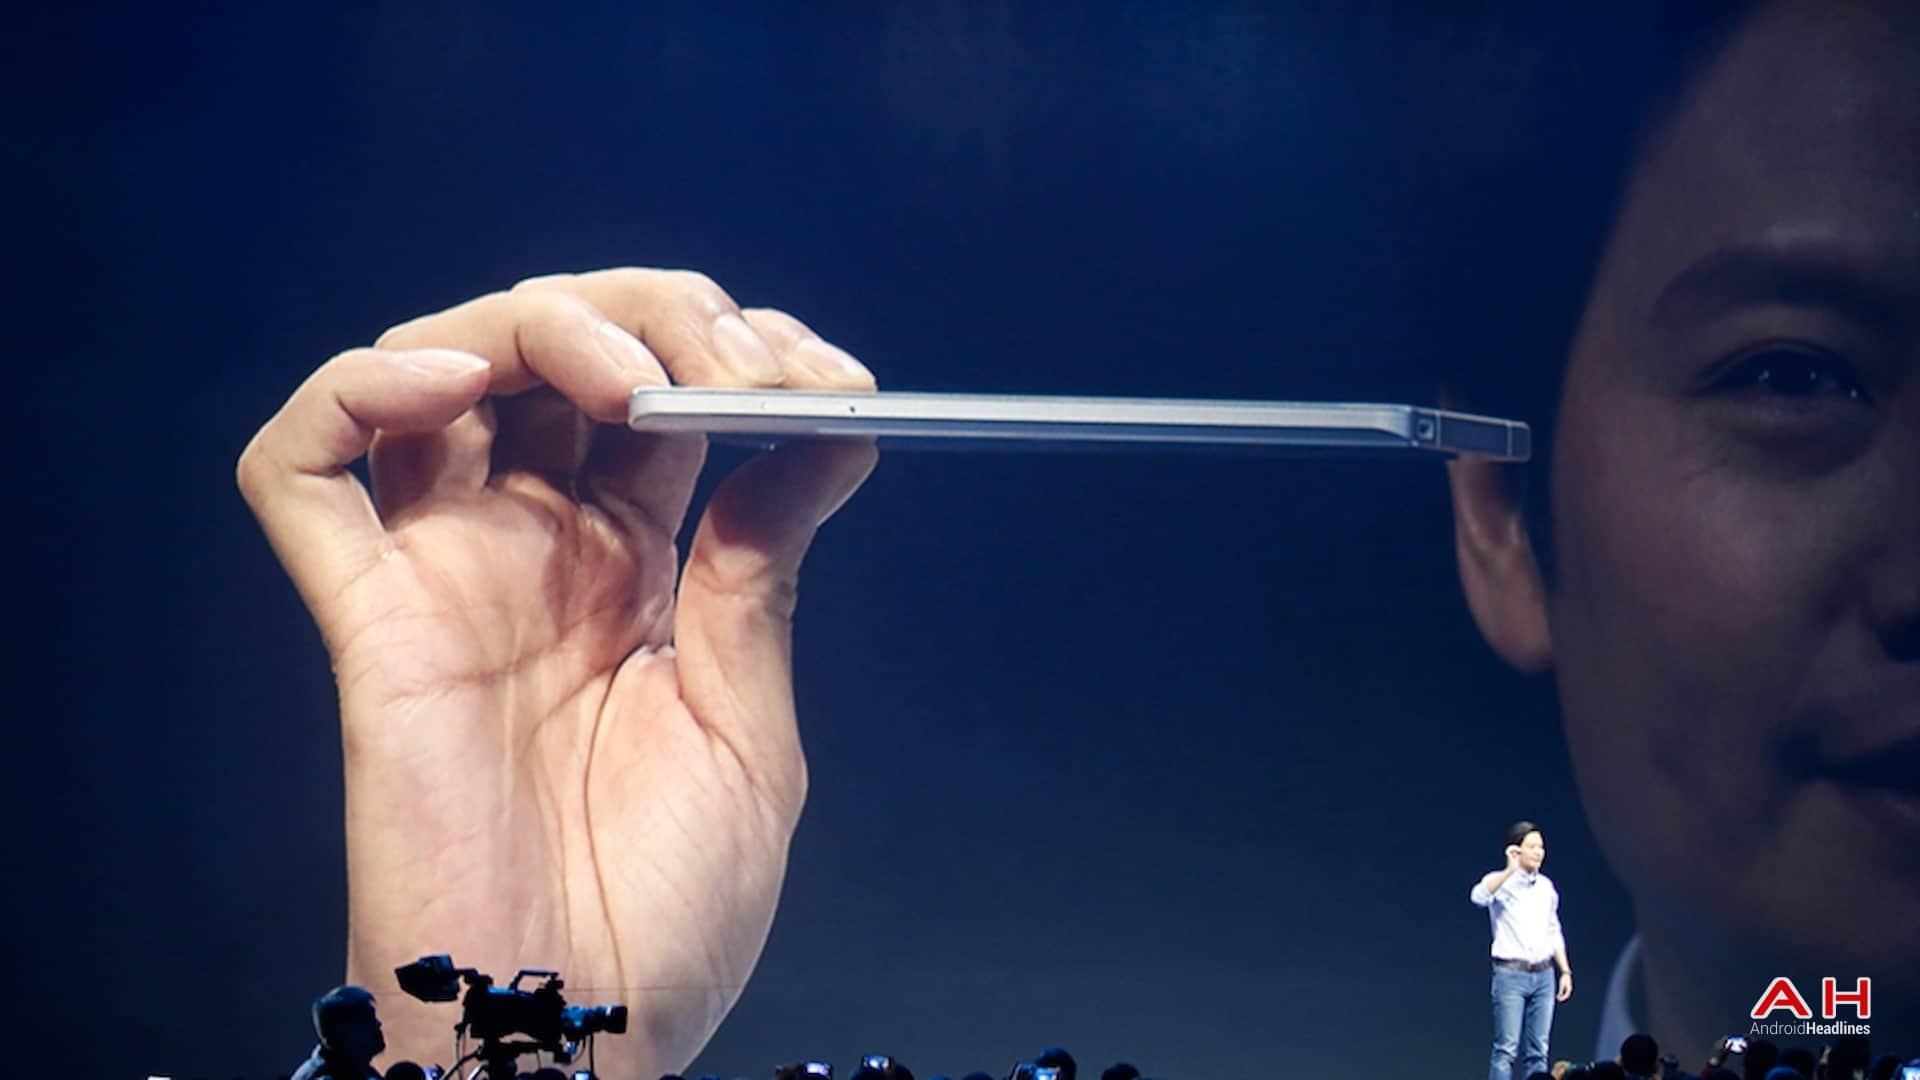 AH Xiaomi Note 4